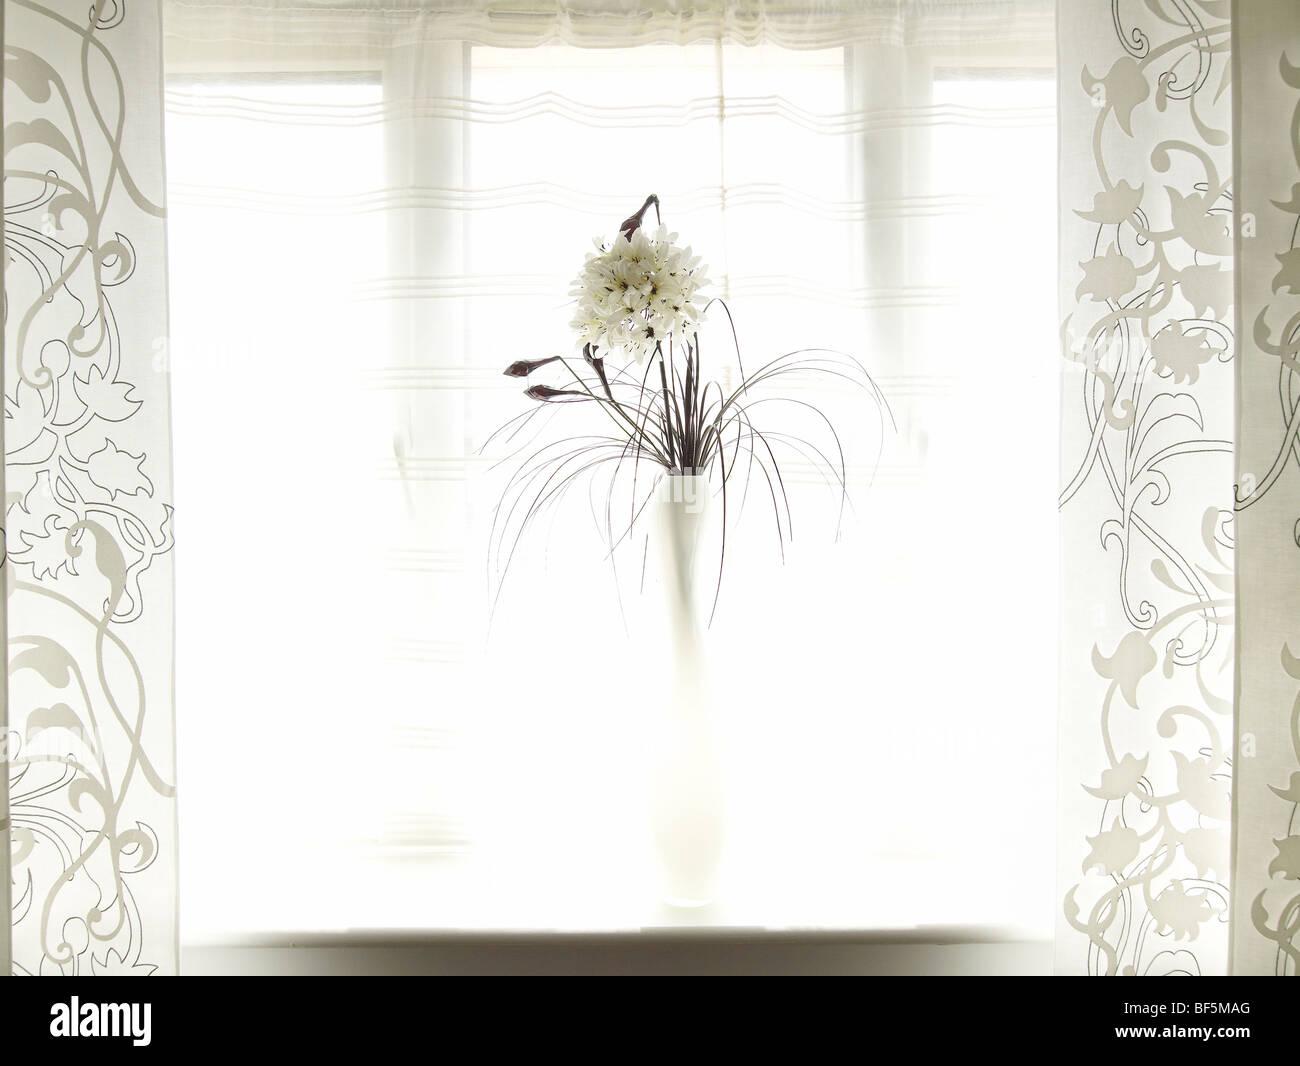 vase in window - Stock Image